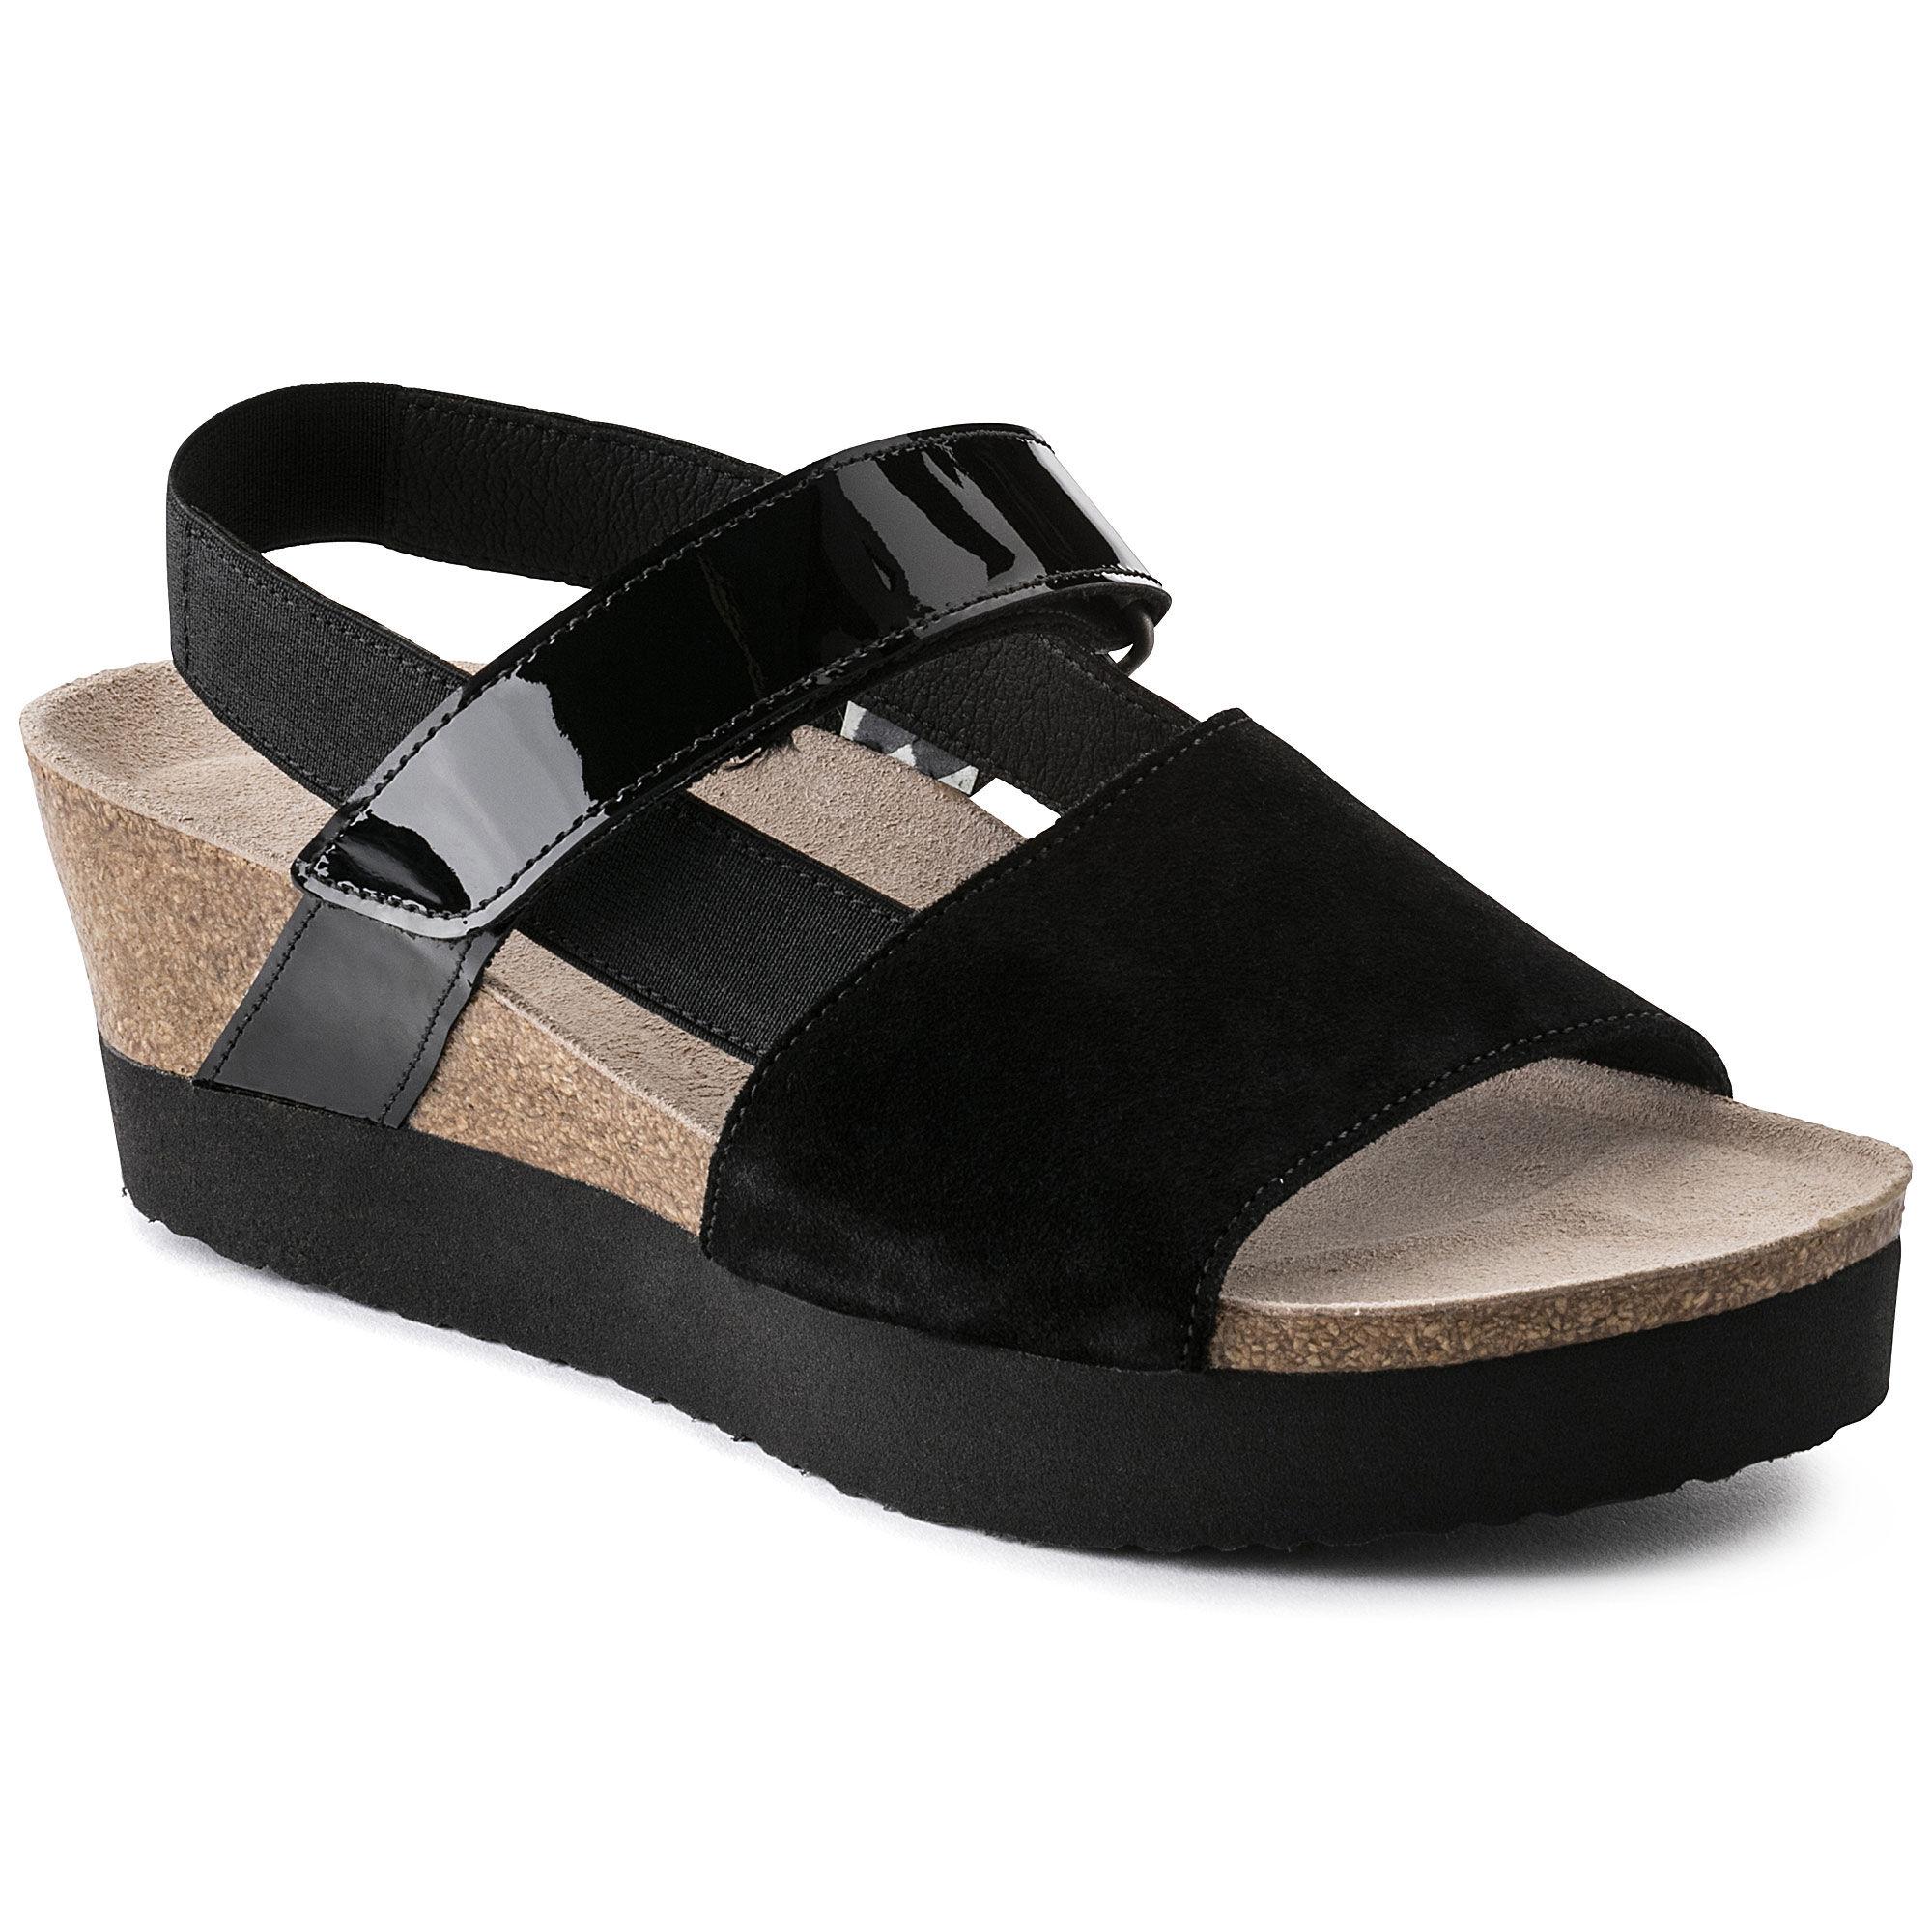 Linda Suede Leather/PVC/Stretch Black